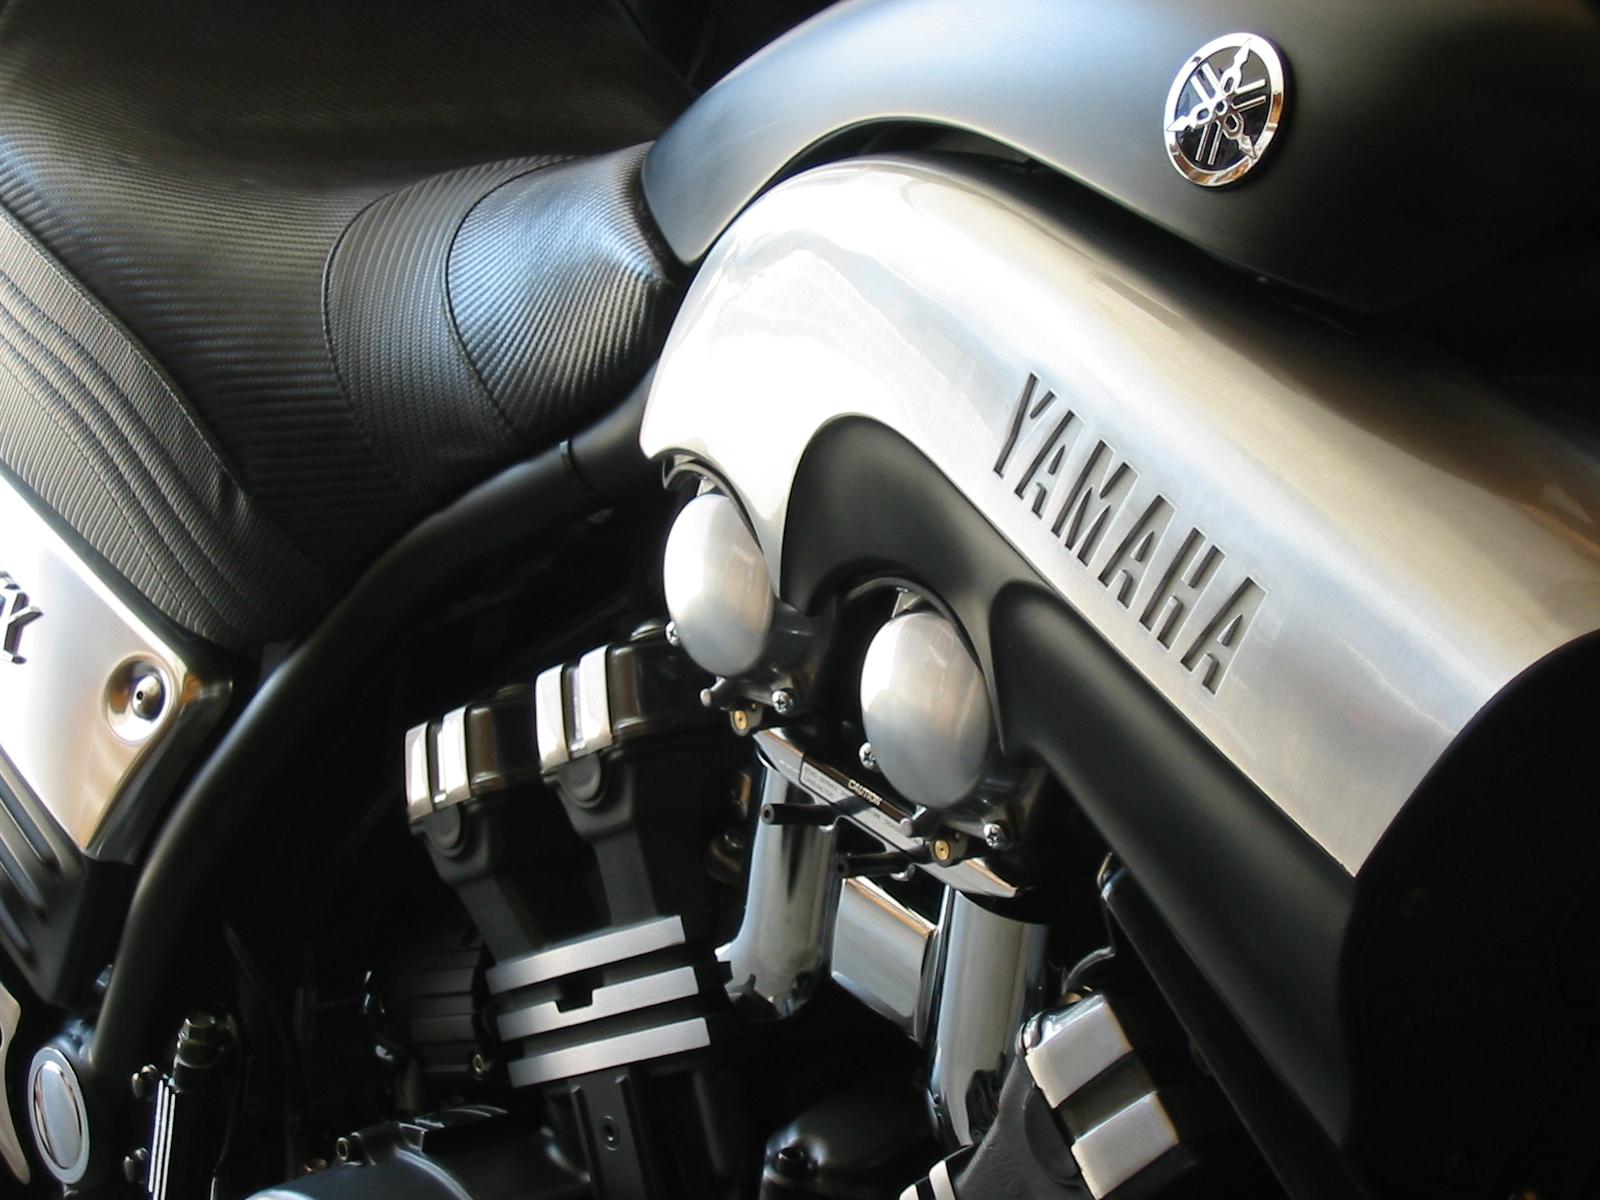 V-Max moto pour motard expérimenté